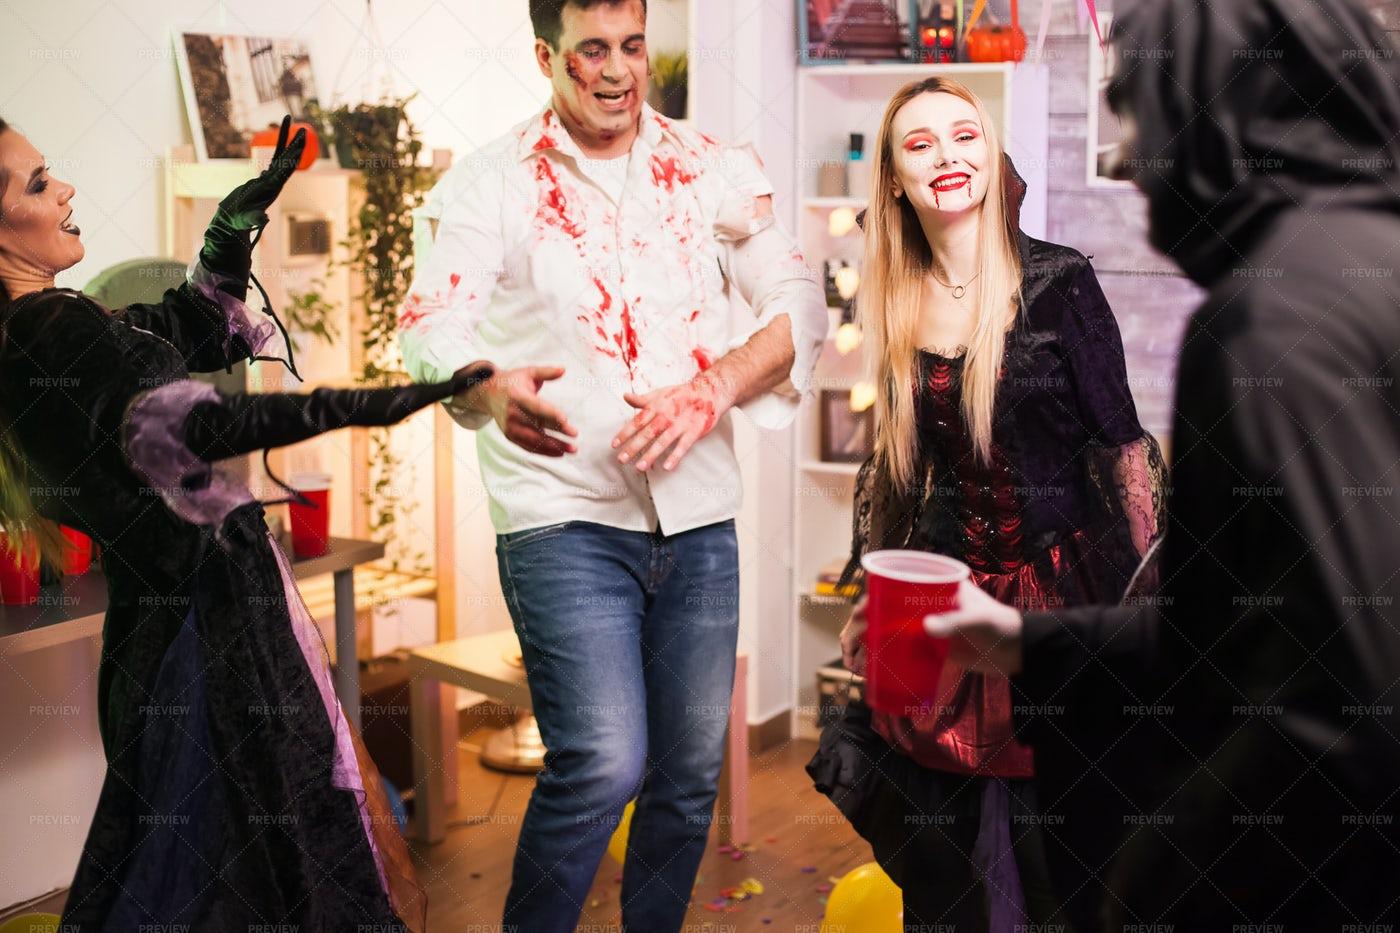 Zombie Enjoying The Party: Stock Photos